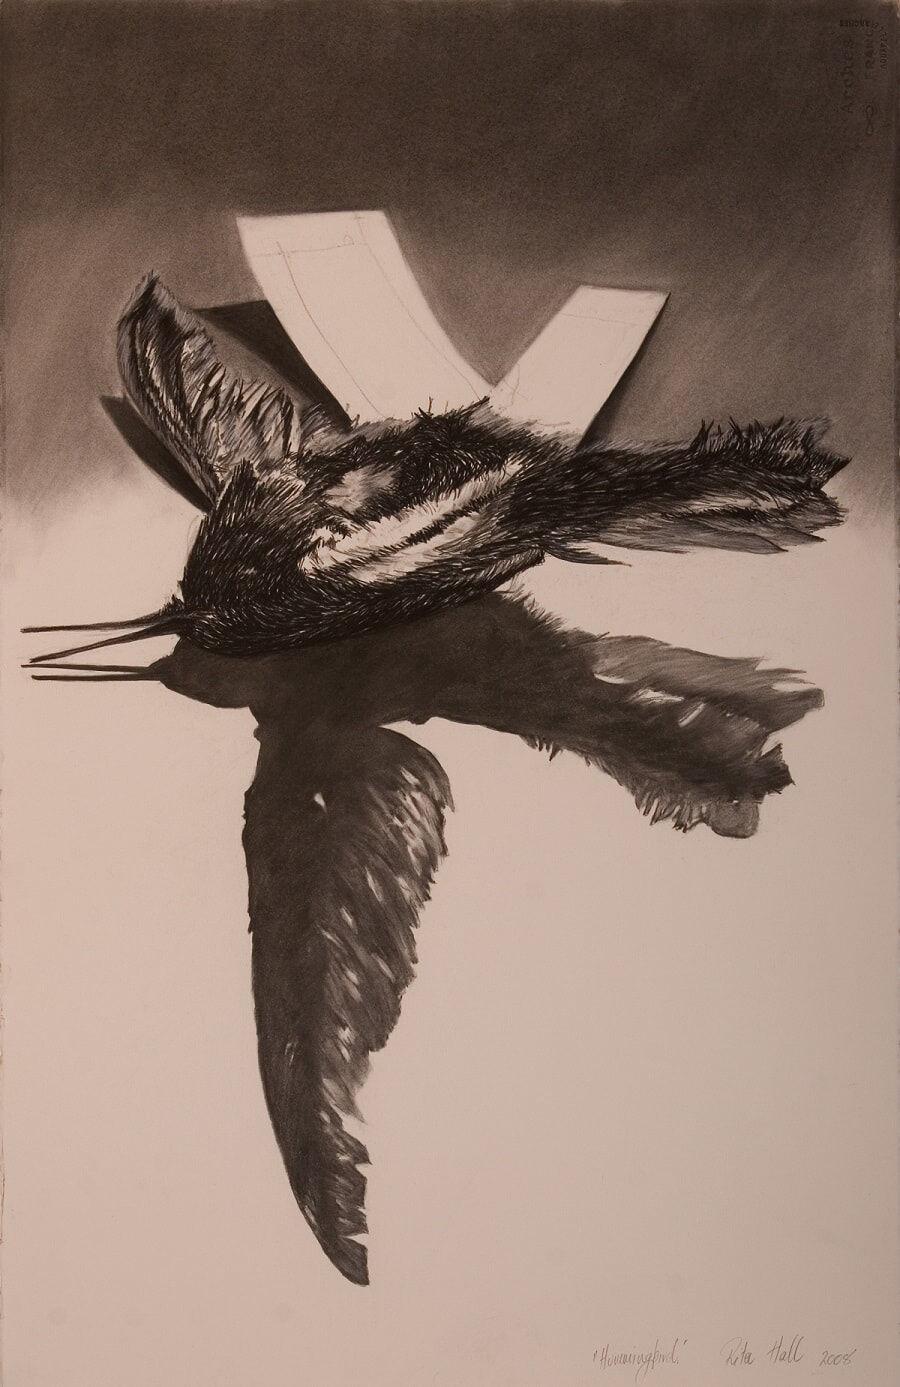 Hummingbird 2008 charcoal, conte, white chalk 102.5 x 66.5 cm- AGSA Collection 2019